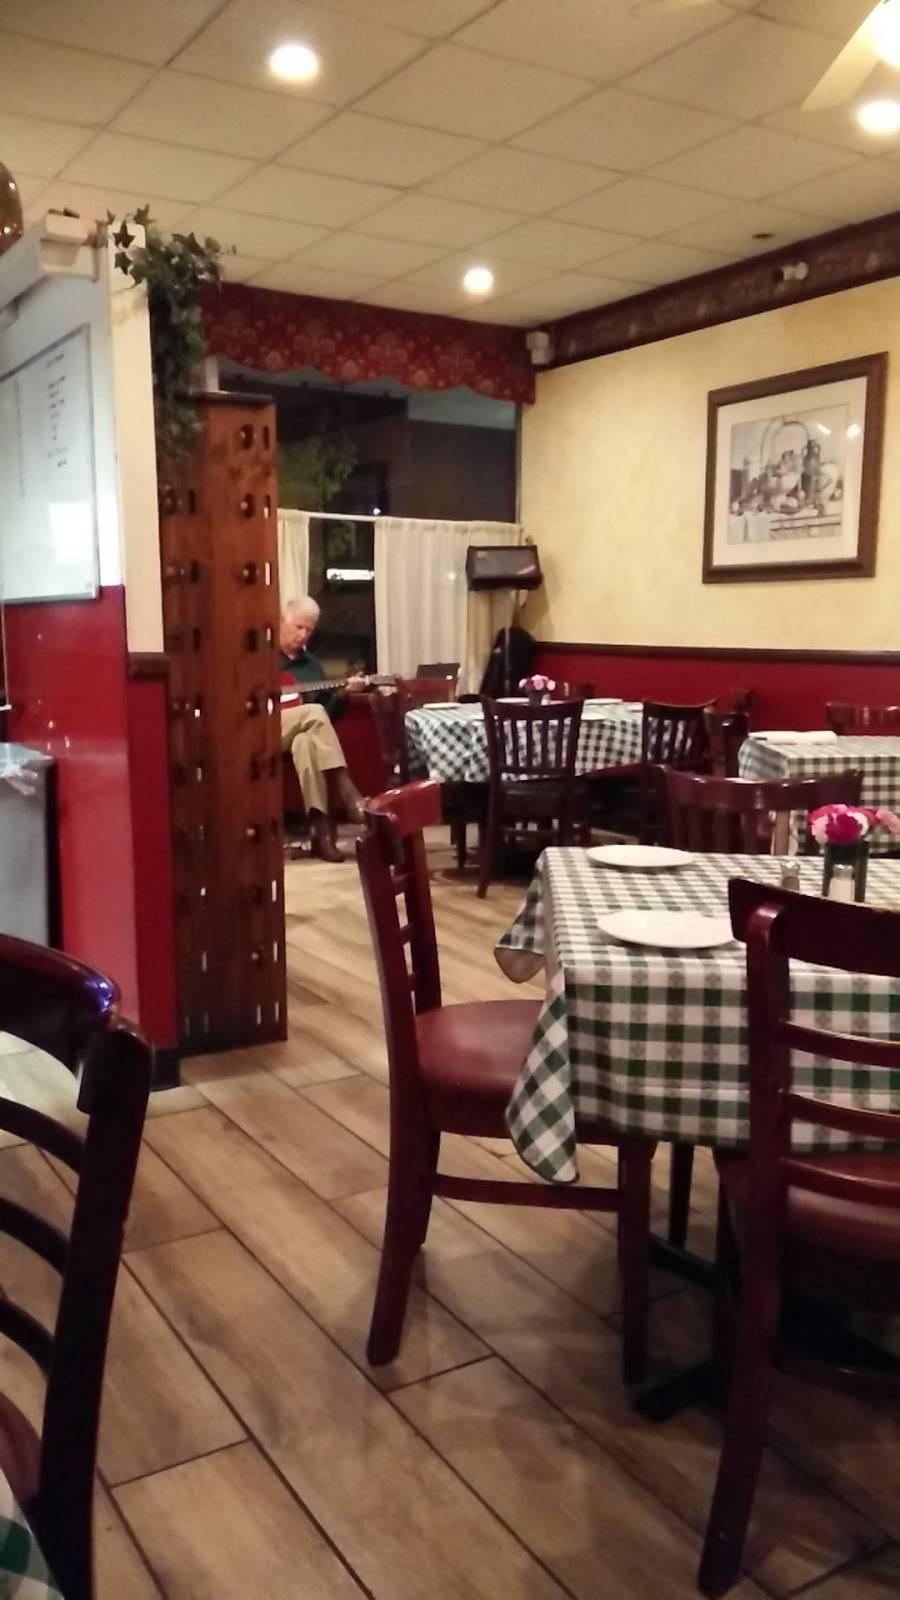 Francos Italian Restaurant - bakery  | Photo 10 of 10 | Address: 4453 W Cerritos Ave, Cypress, CA 90630, USA | Phone: (714) 761-9040